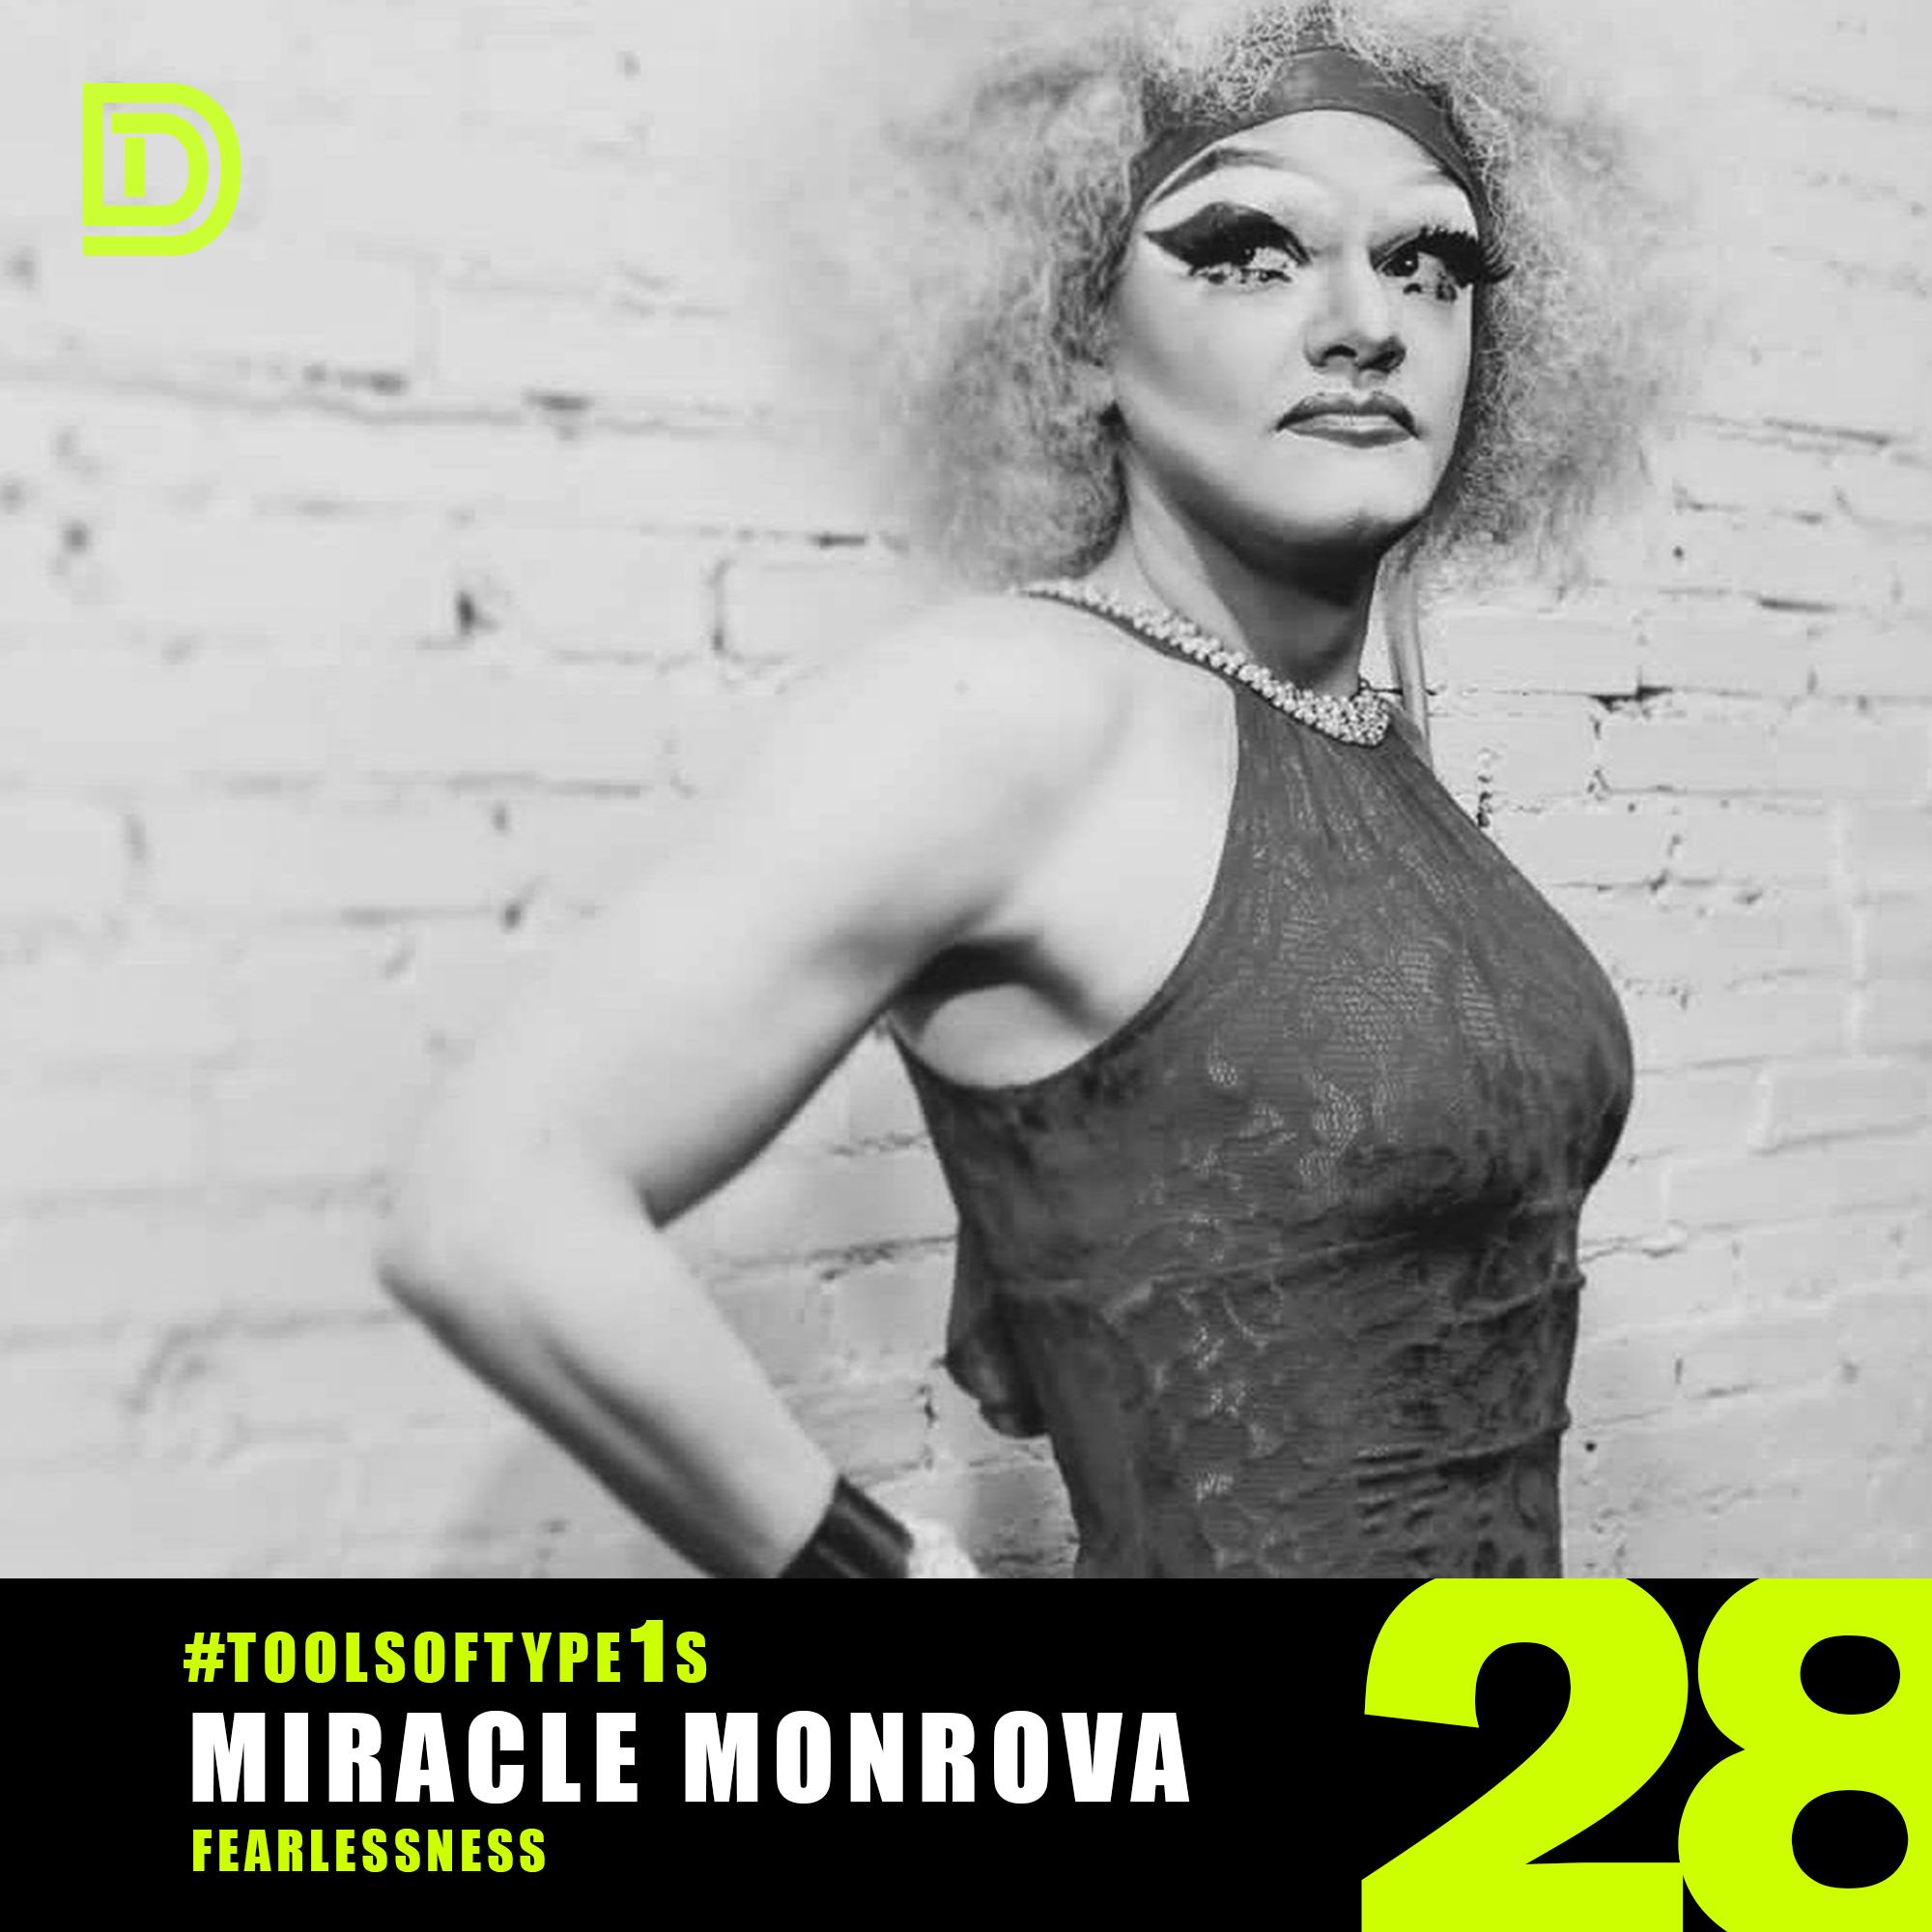 Mircale-Monrova.png